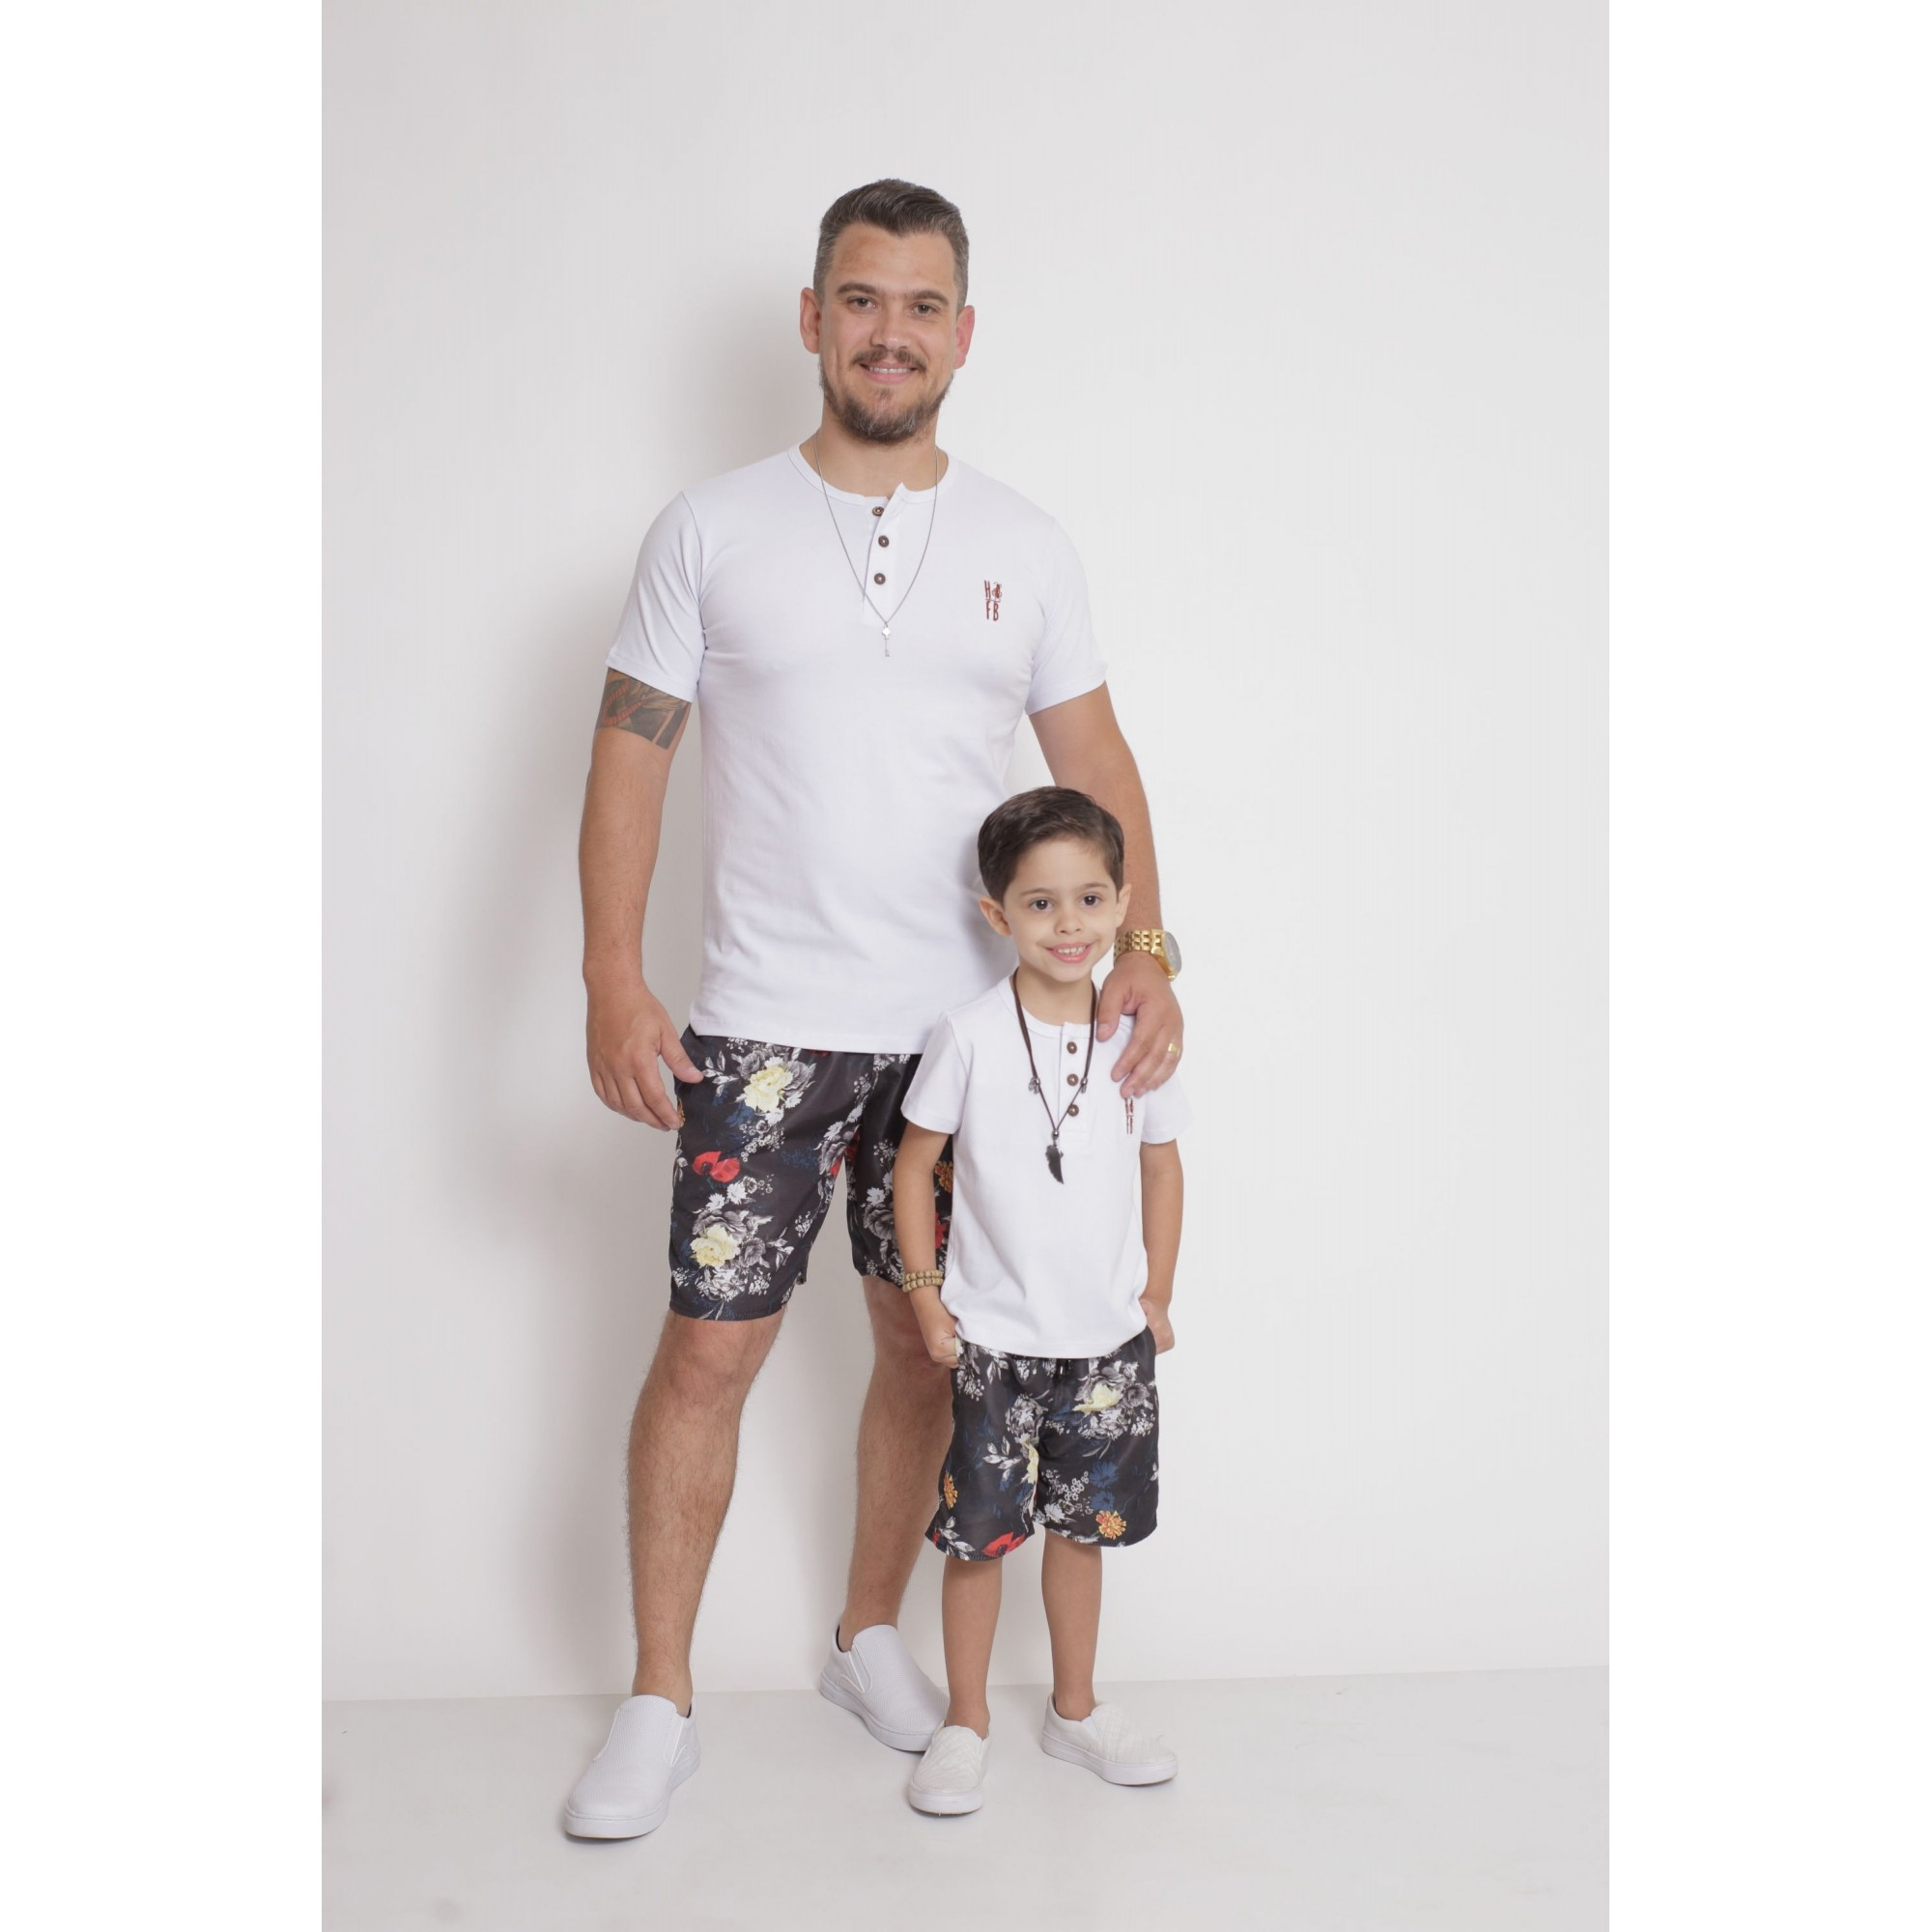 PAI E FILHO > Kit 02 Bermudas Preta Floral [Coleção Tal Pai Tal Filho]  - Heitor Fashion Brazil